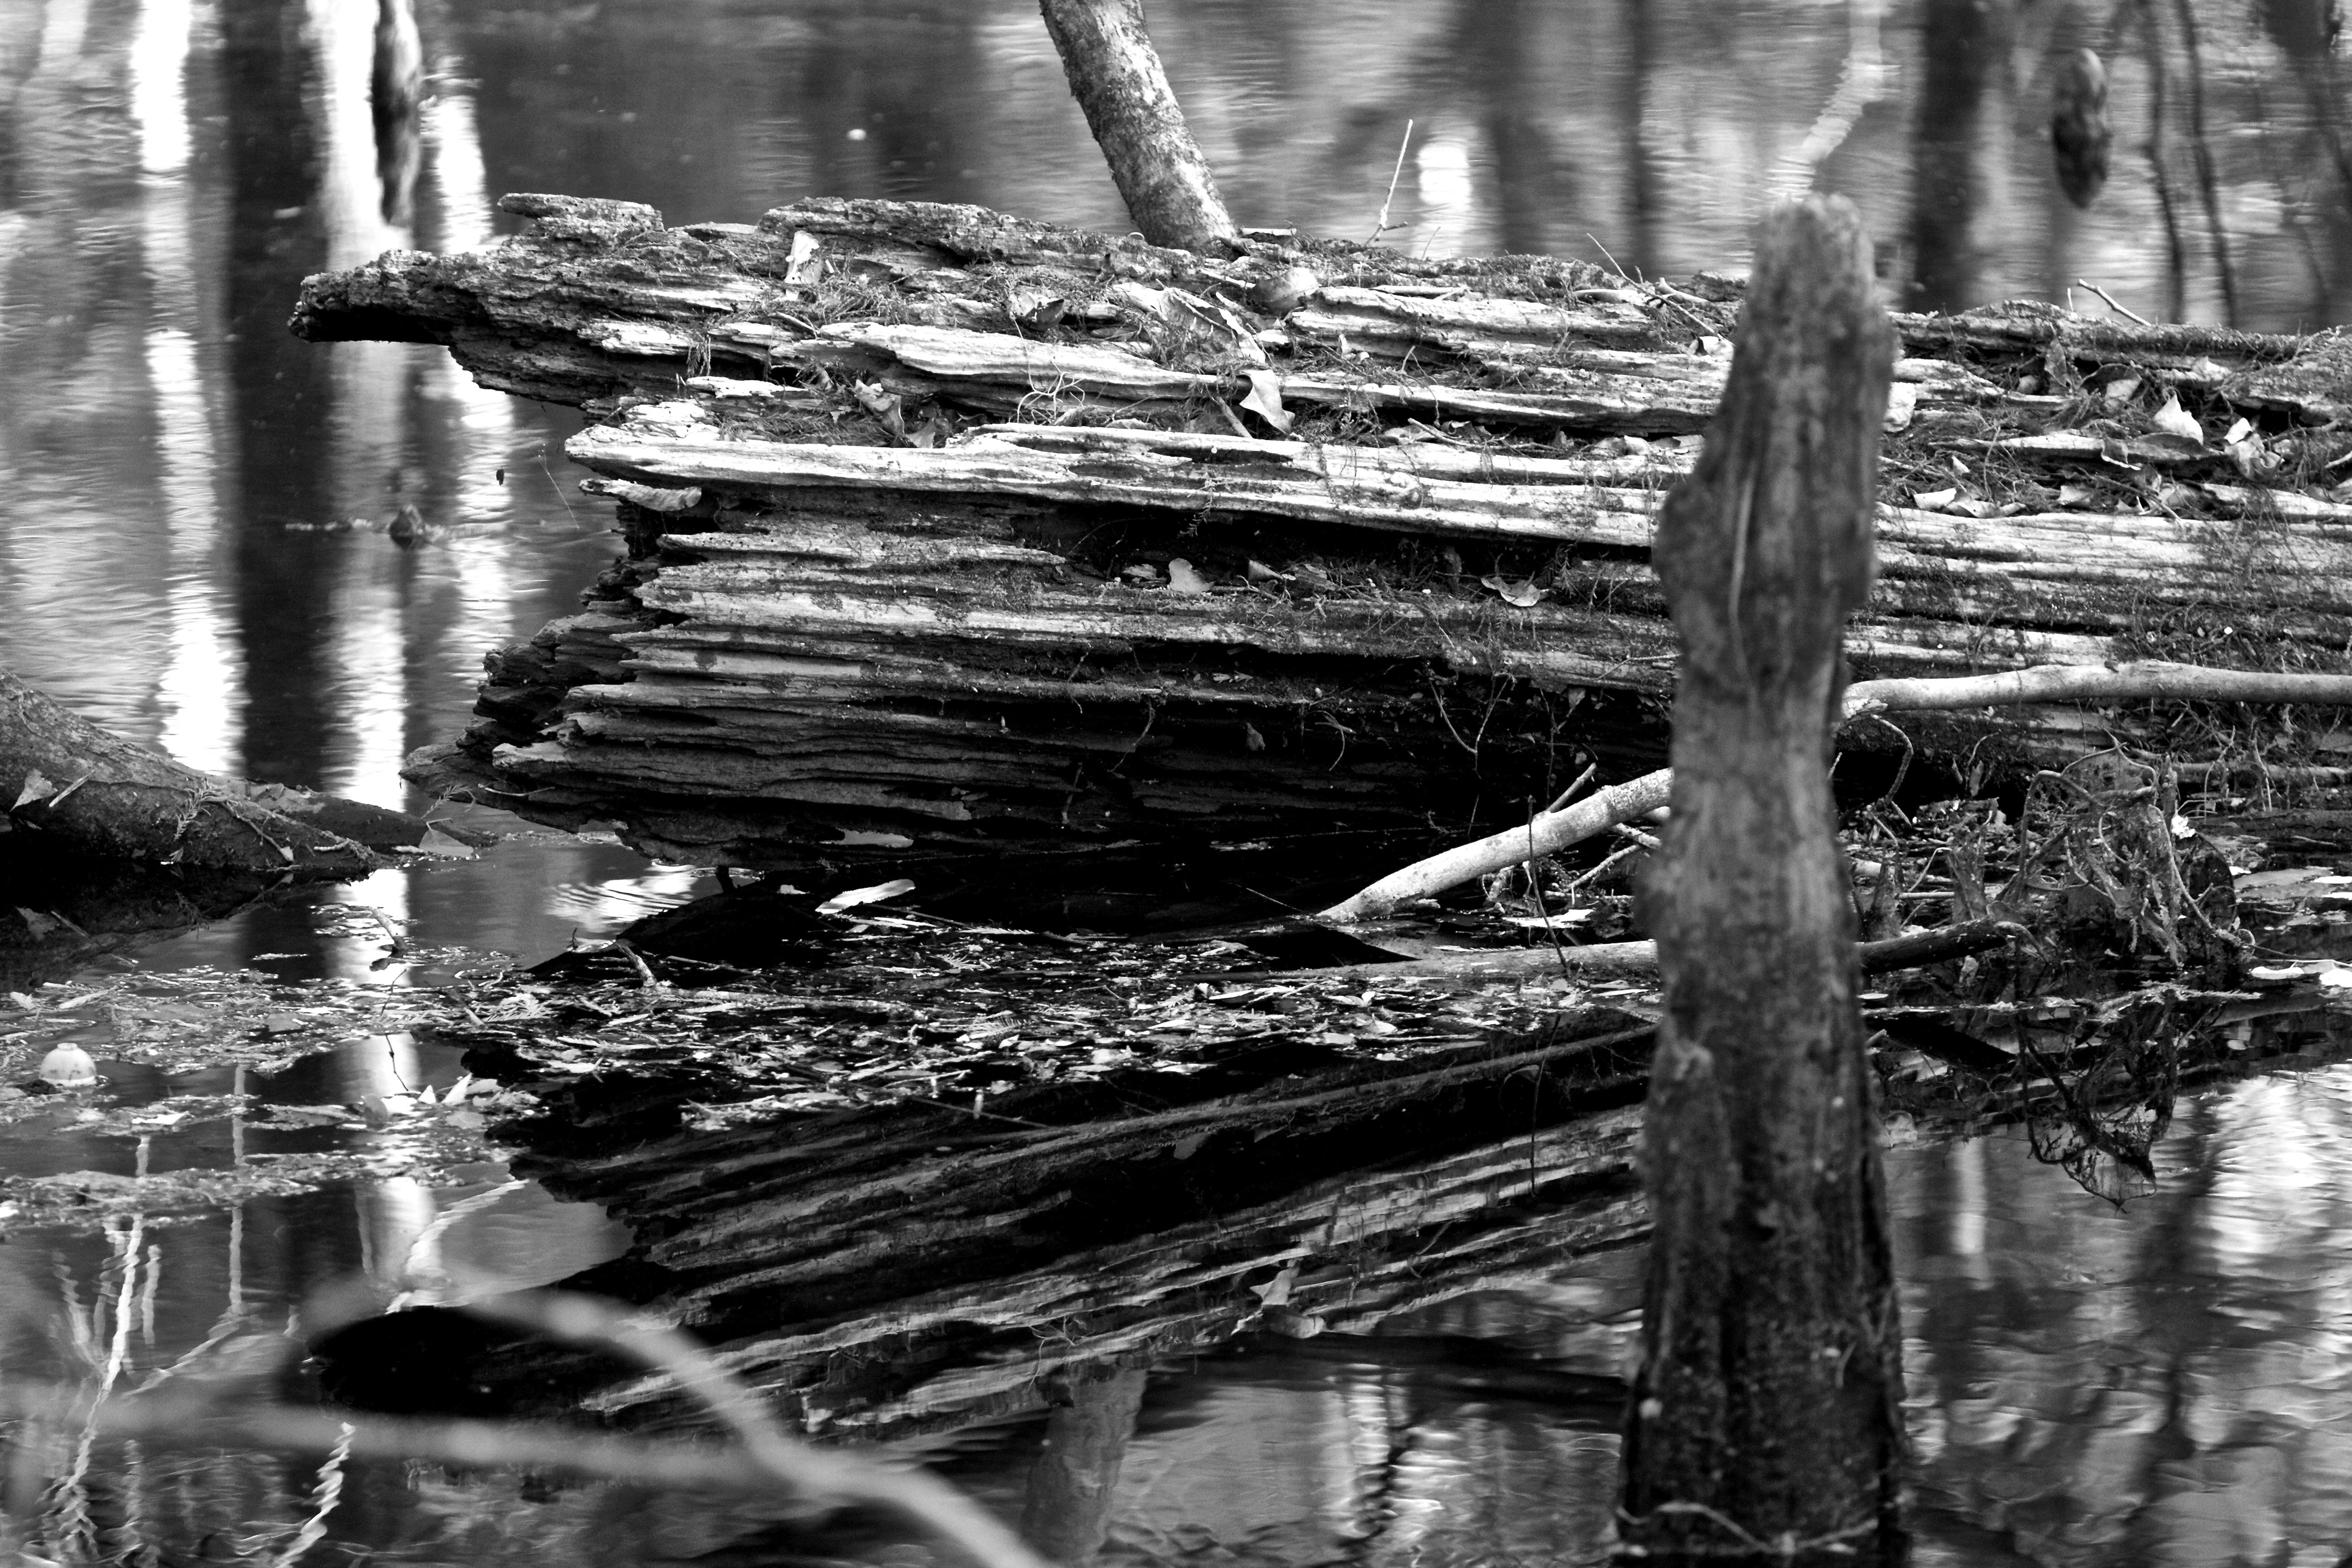 Log in Swamp